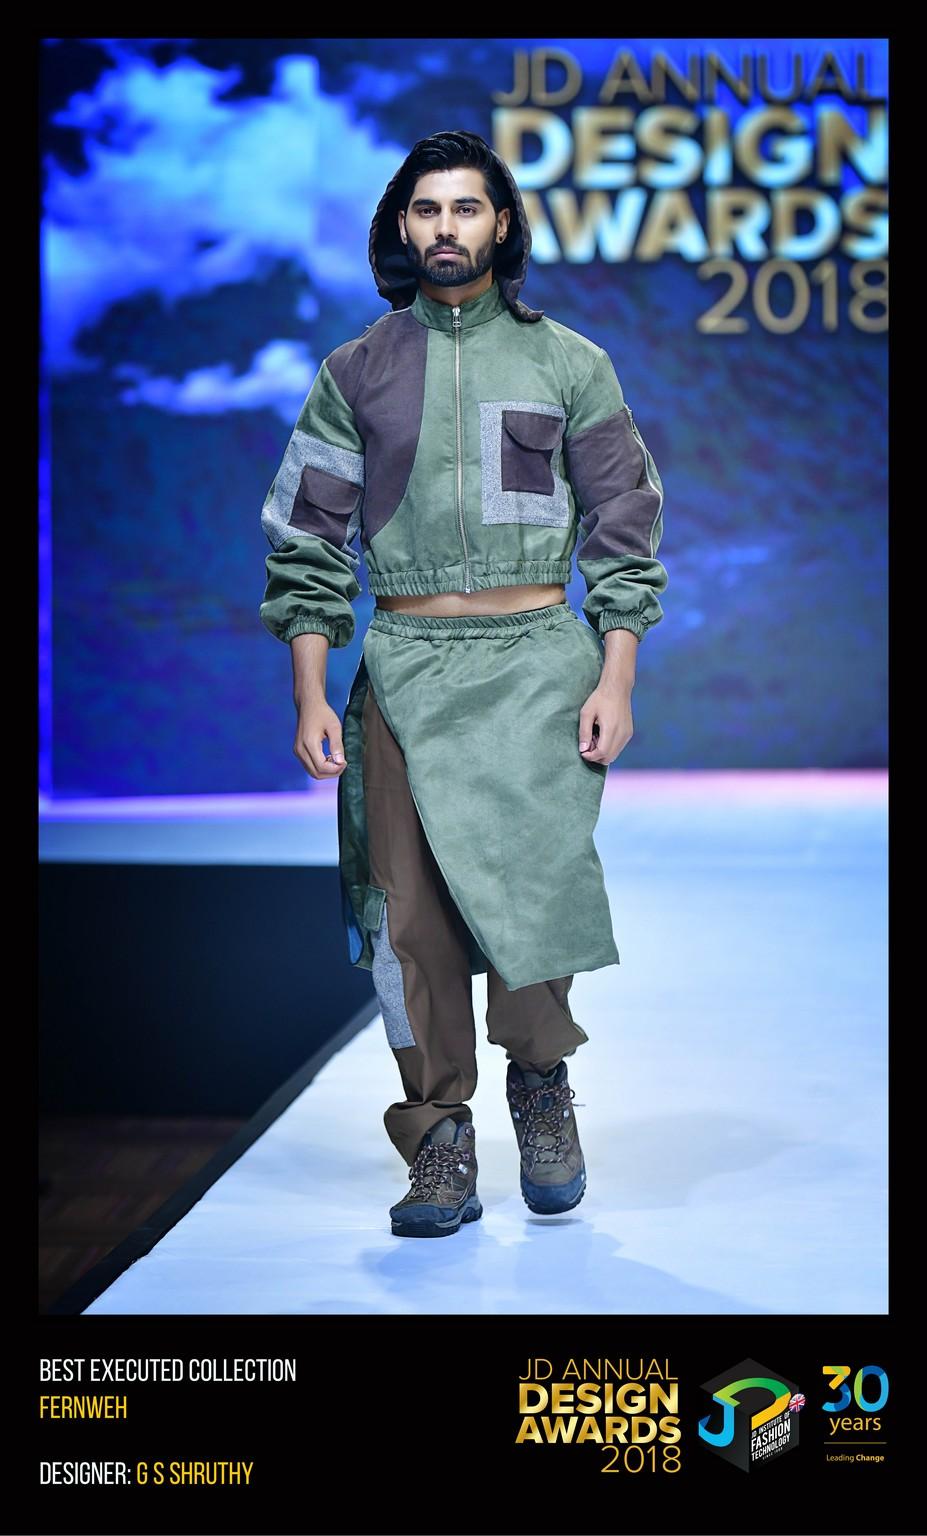 Fernweh – Change – JD Annual Design Awards 2018 | Designer: G.S Shruthi (ADFD 2015 Batch) | Photography : Jerin Nath (@jerin_nath) fernweh Fernweh – Change – JD Annual Design Awards 2018 FERNWEH4